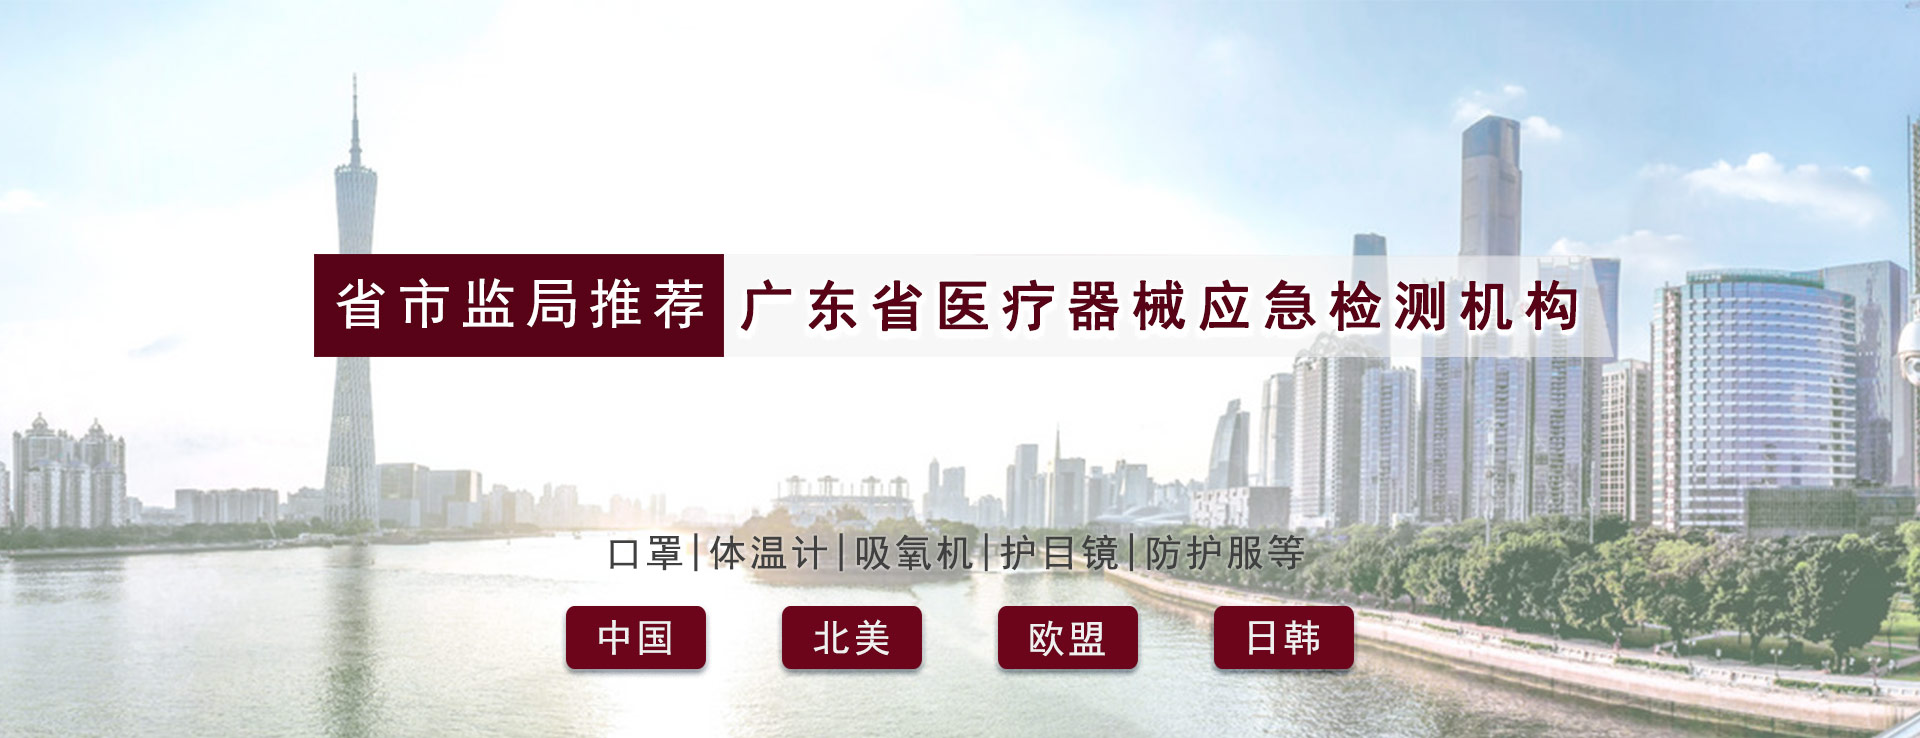 m6米乐app官网下载报告